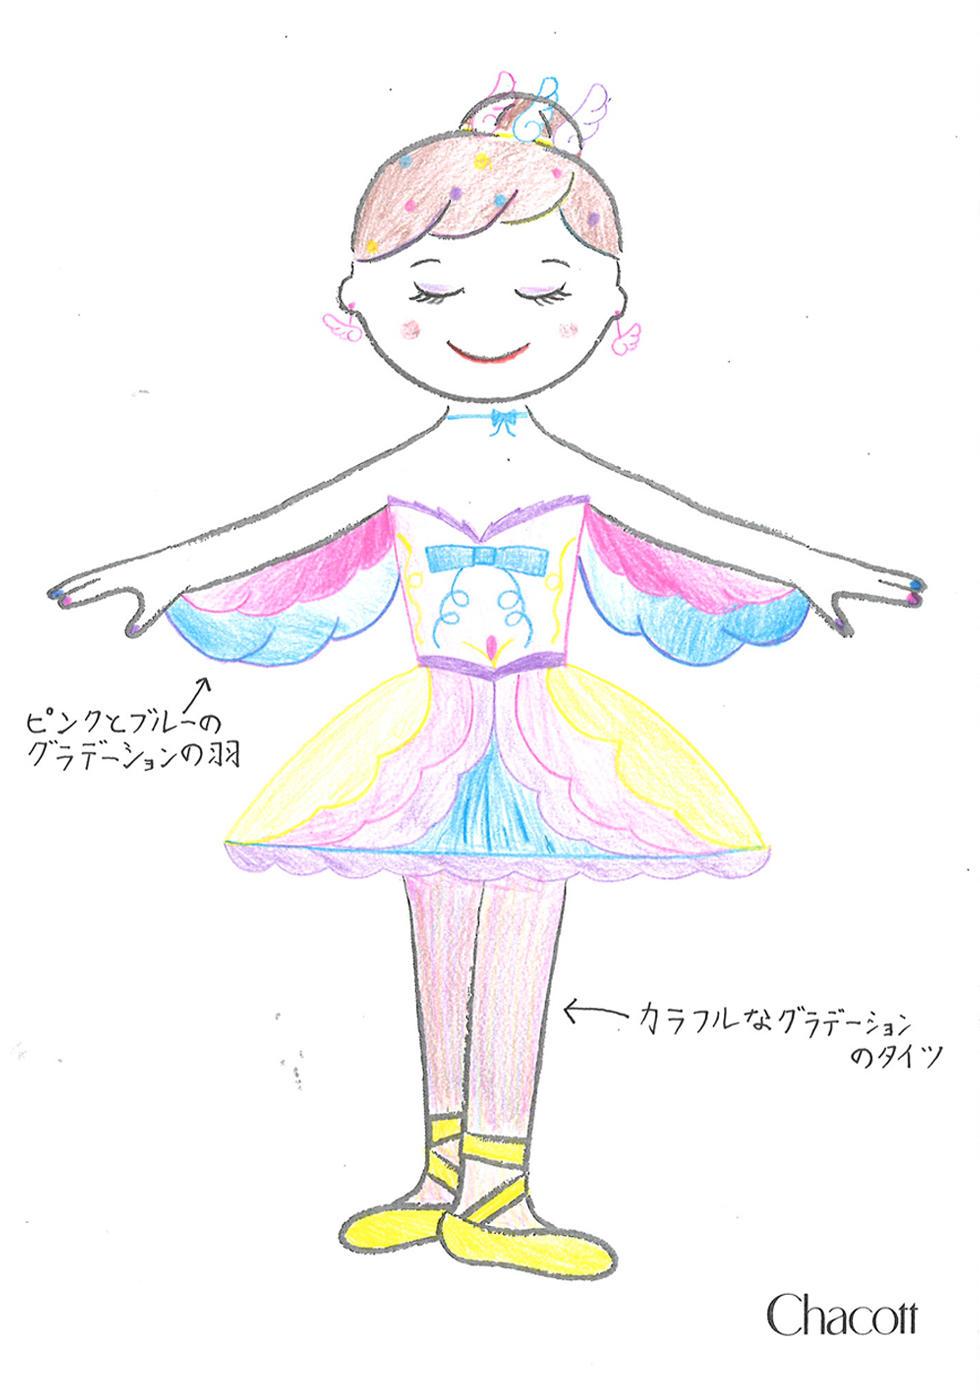 hiroshima_costume_design_2020_7.jpg